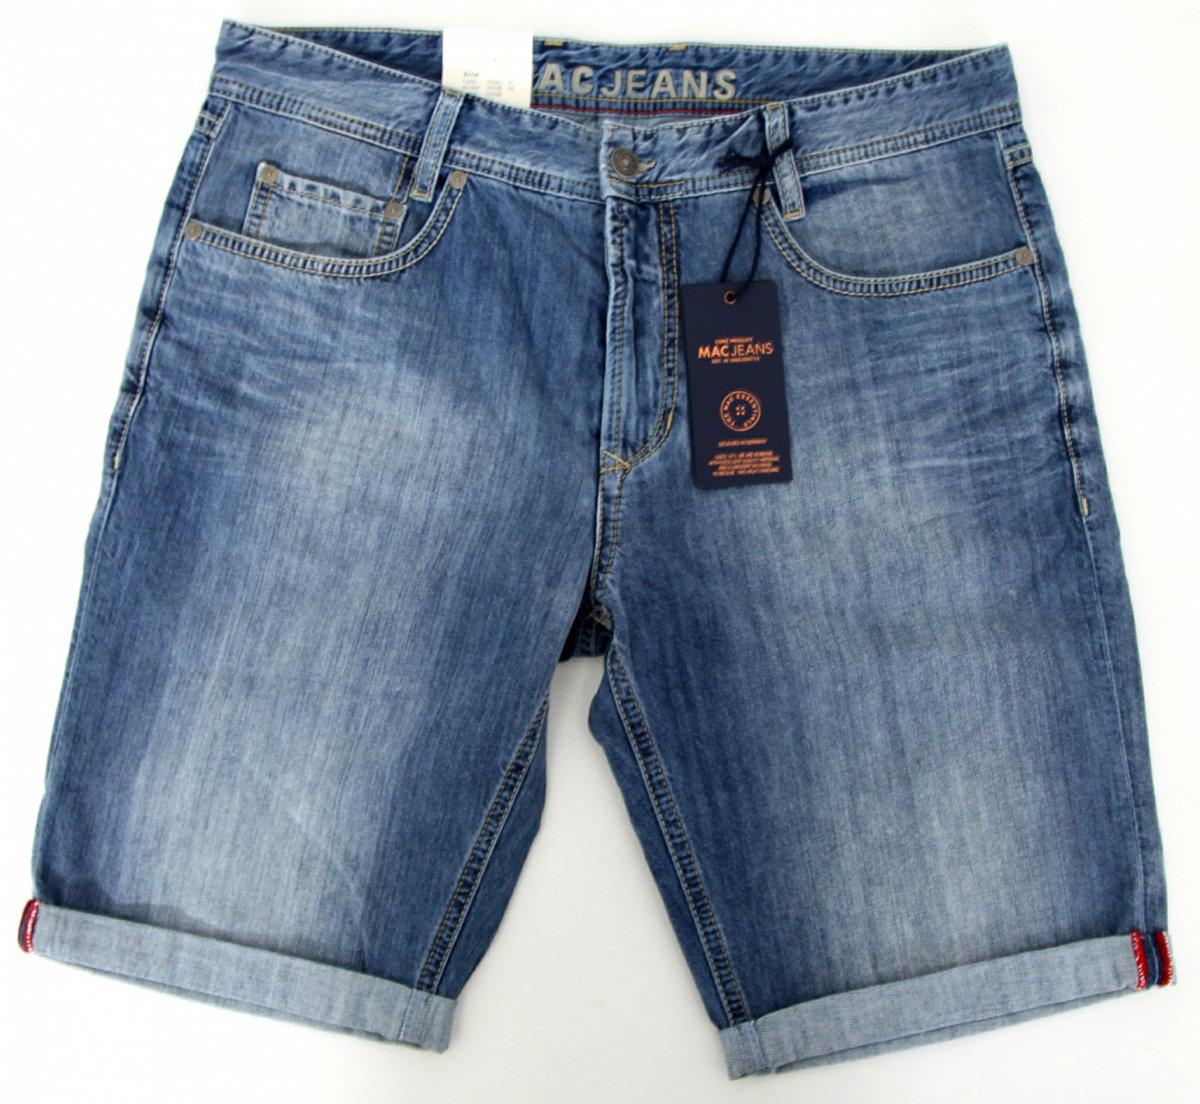 mac jeans herren hose w33 l10 pants shorts arne bermuda 090852 h458 uvp 69 neu ebay. Black Bedroom Furniture Sets. Home Design Ideas